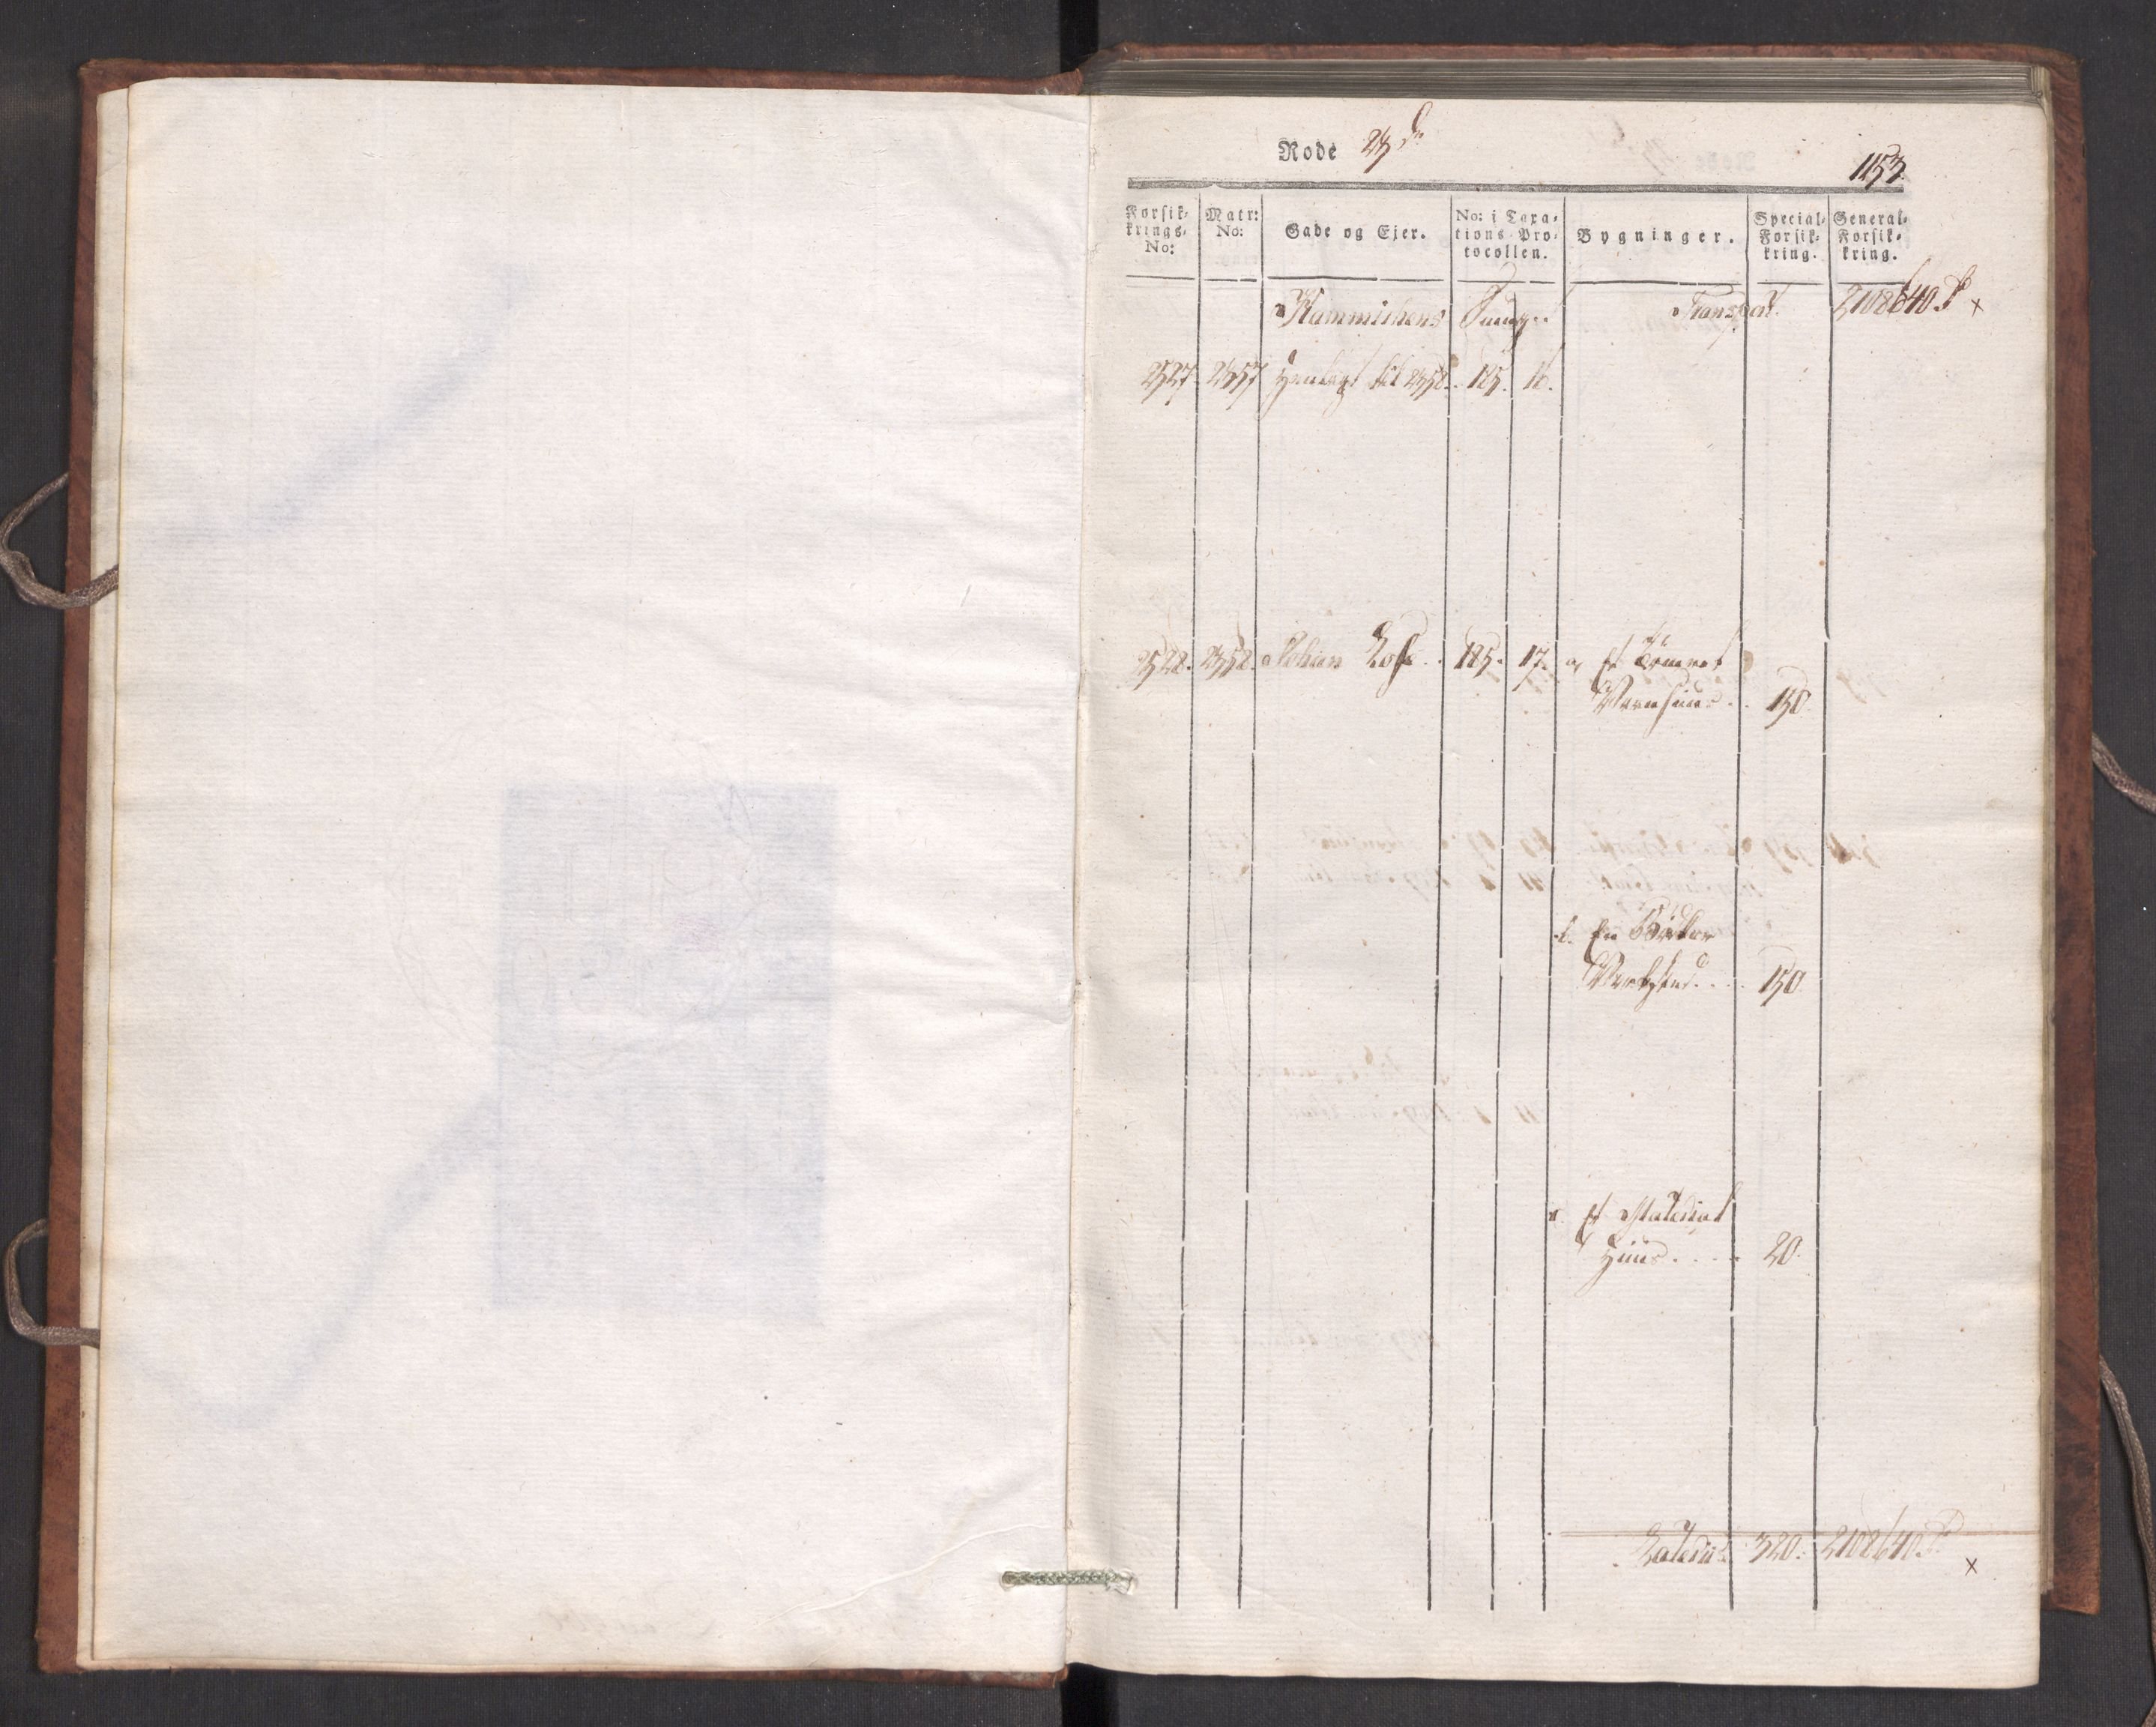 RA, Kommersekollegiet, Brannforsikringskontoret 1767-1814, F/Fa/L0007: Bergen, 1807-1817, s. 1153